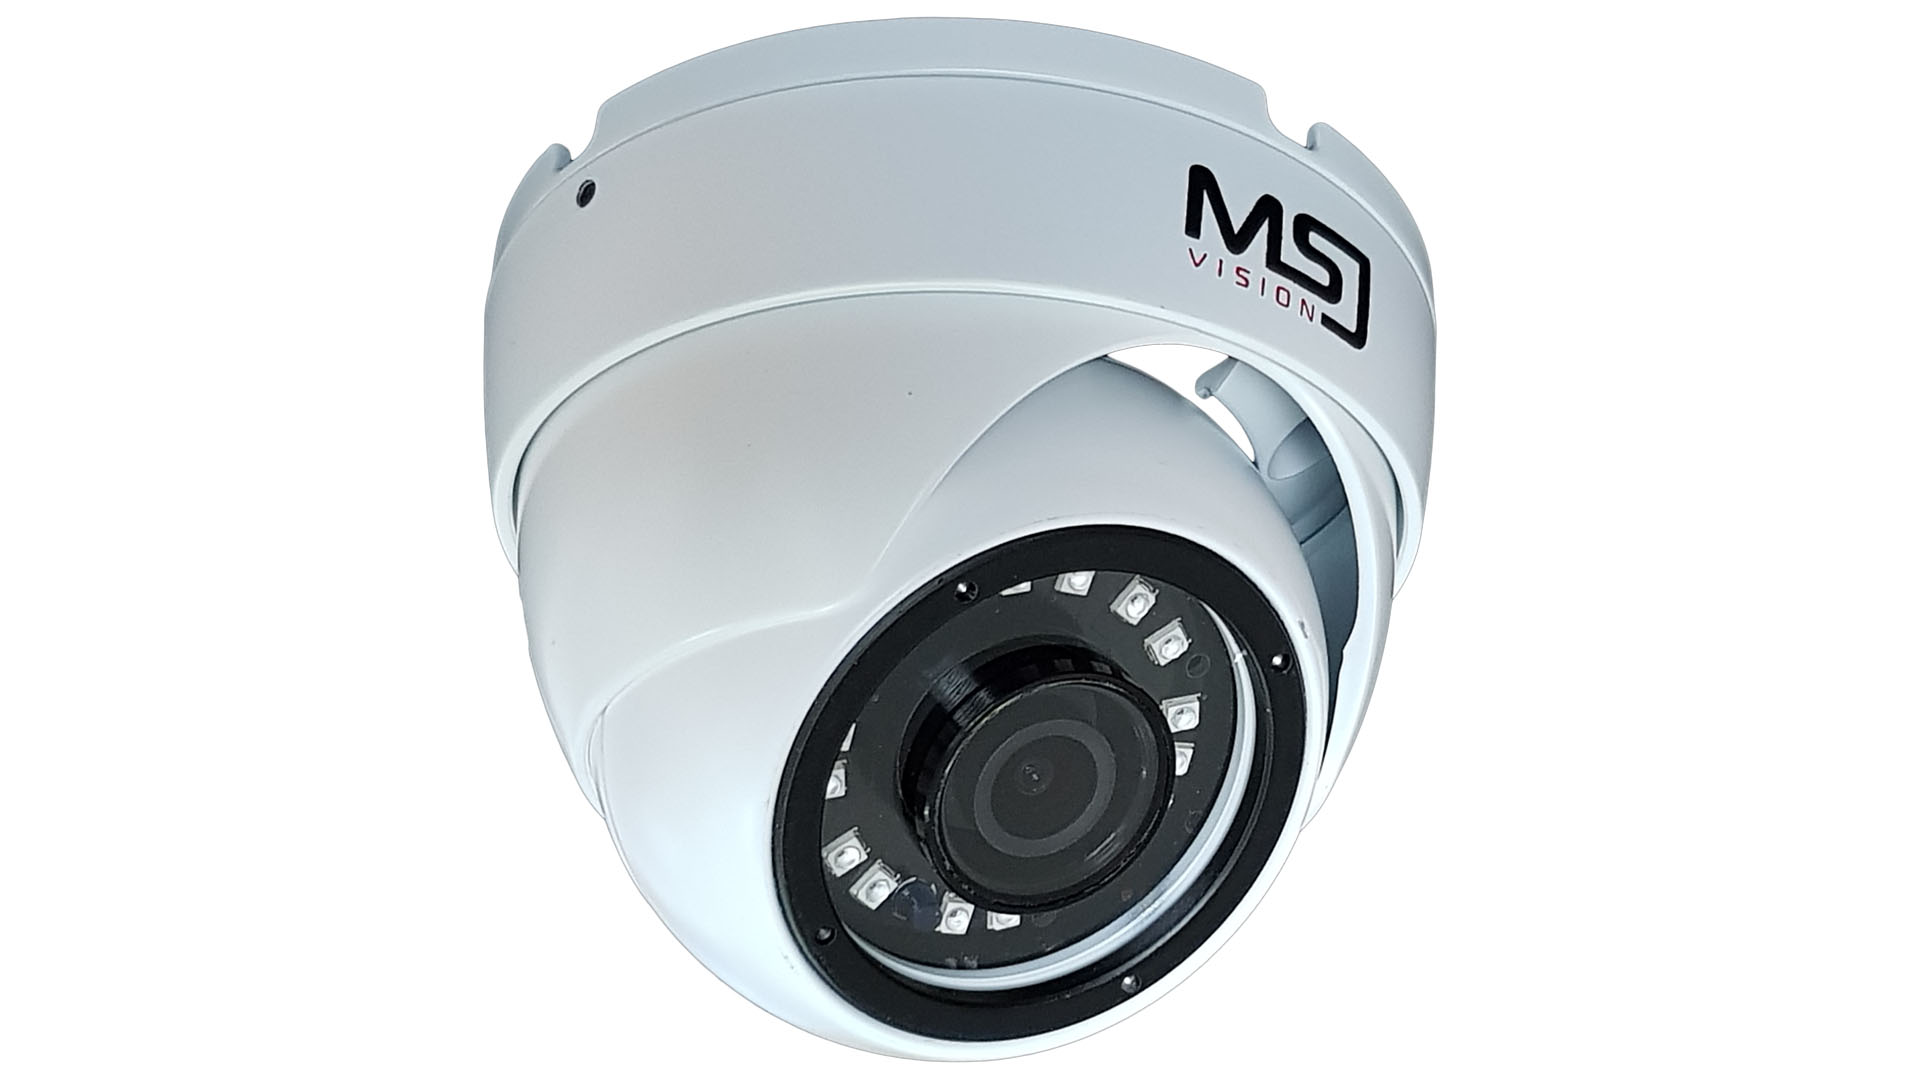 MSJ-HBR-4412W/G-SMT 4MP 2.8mm